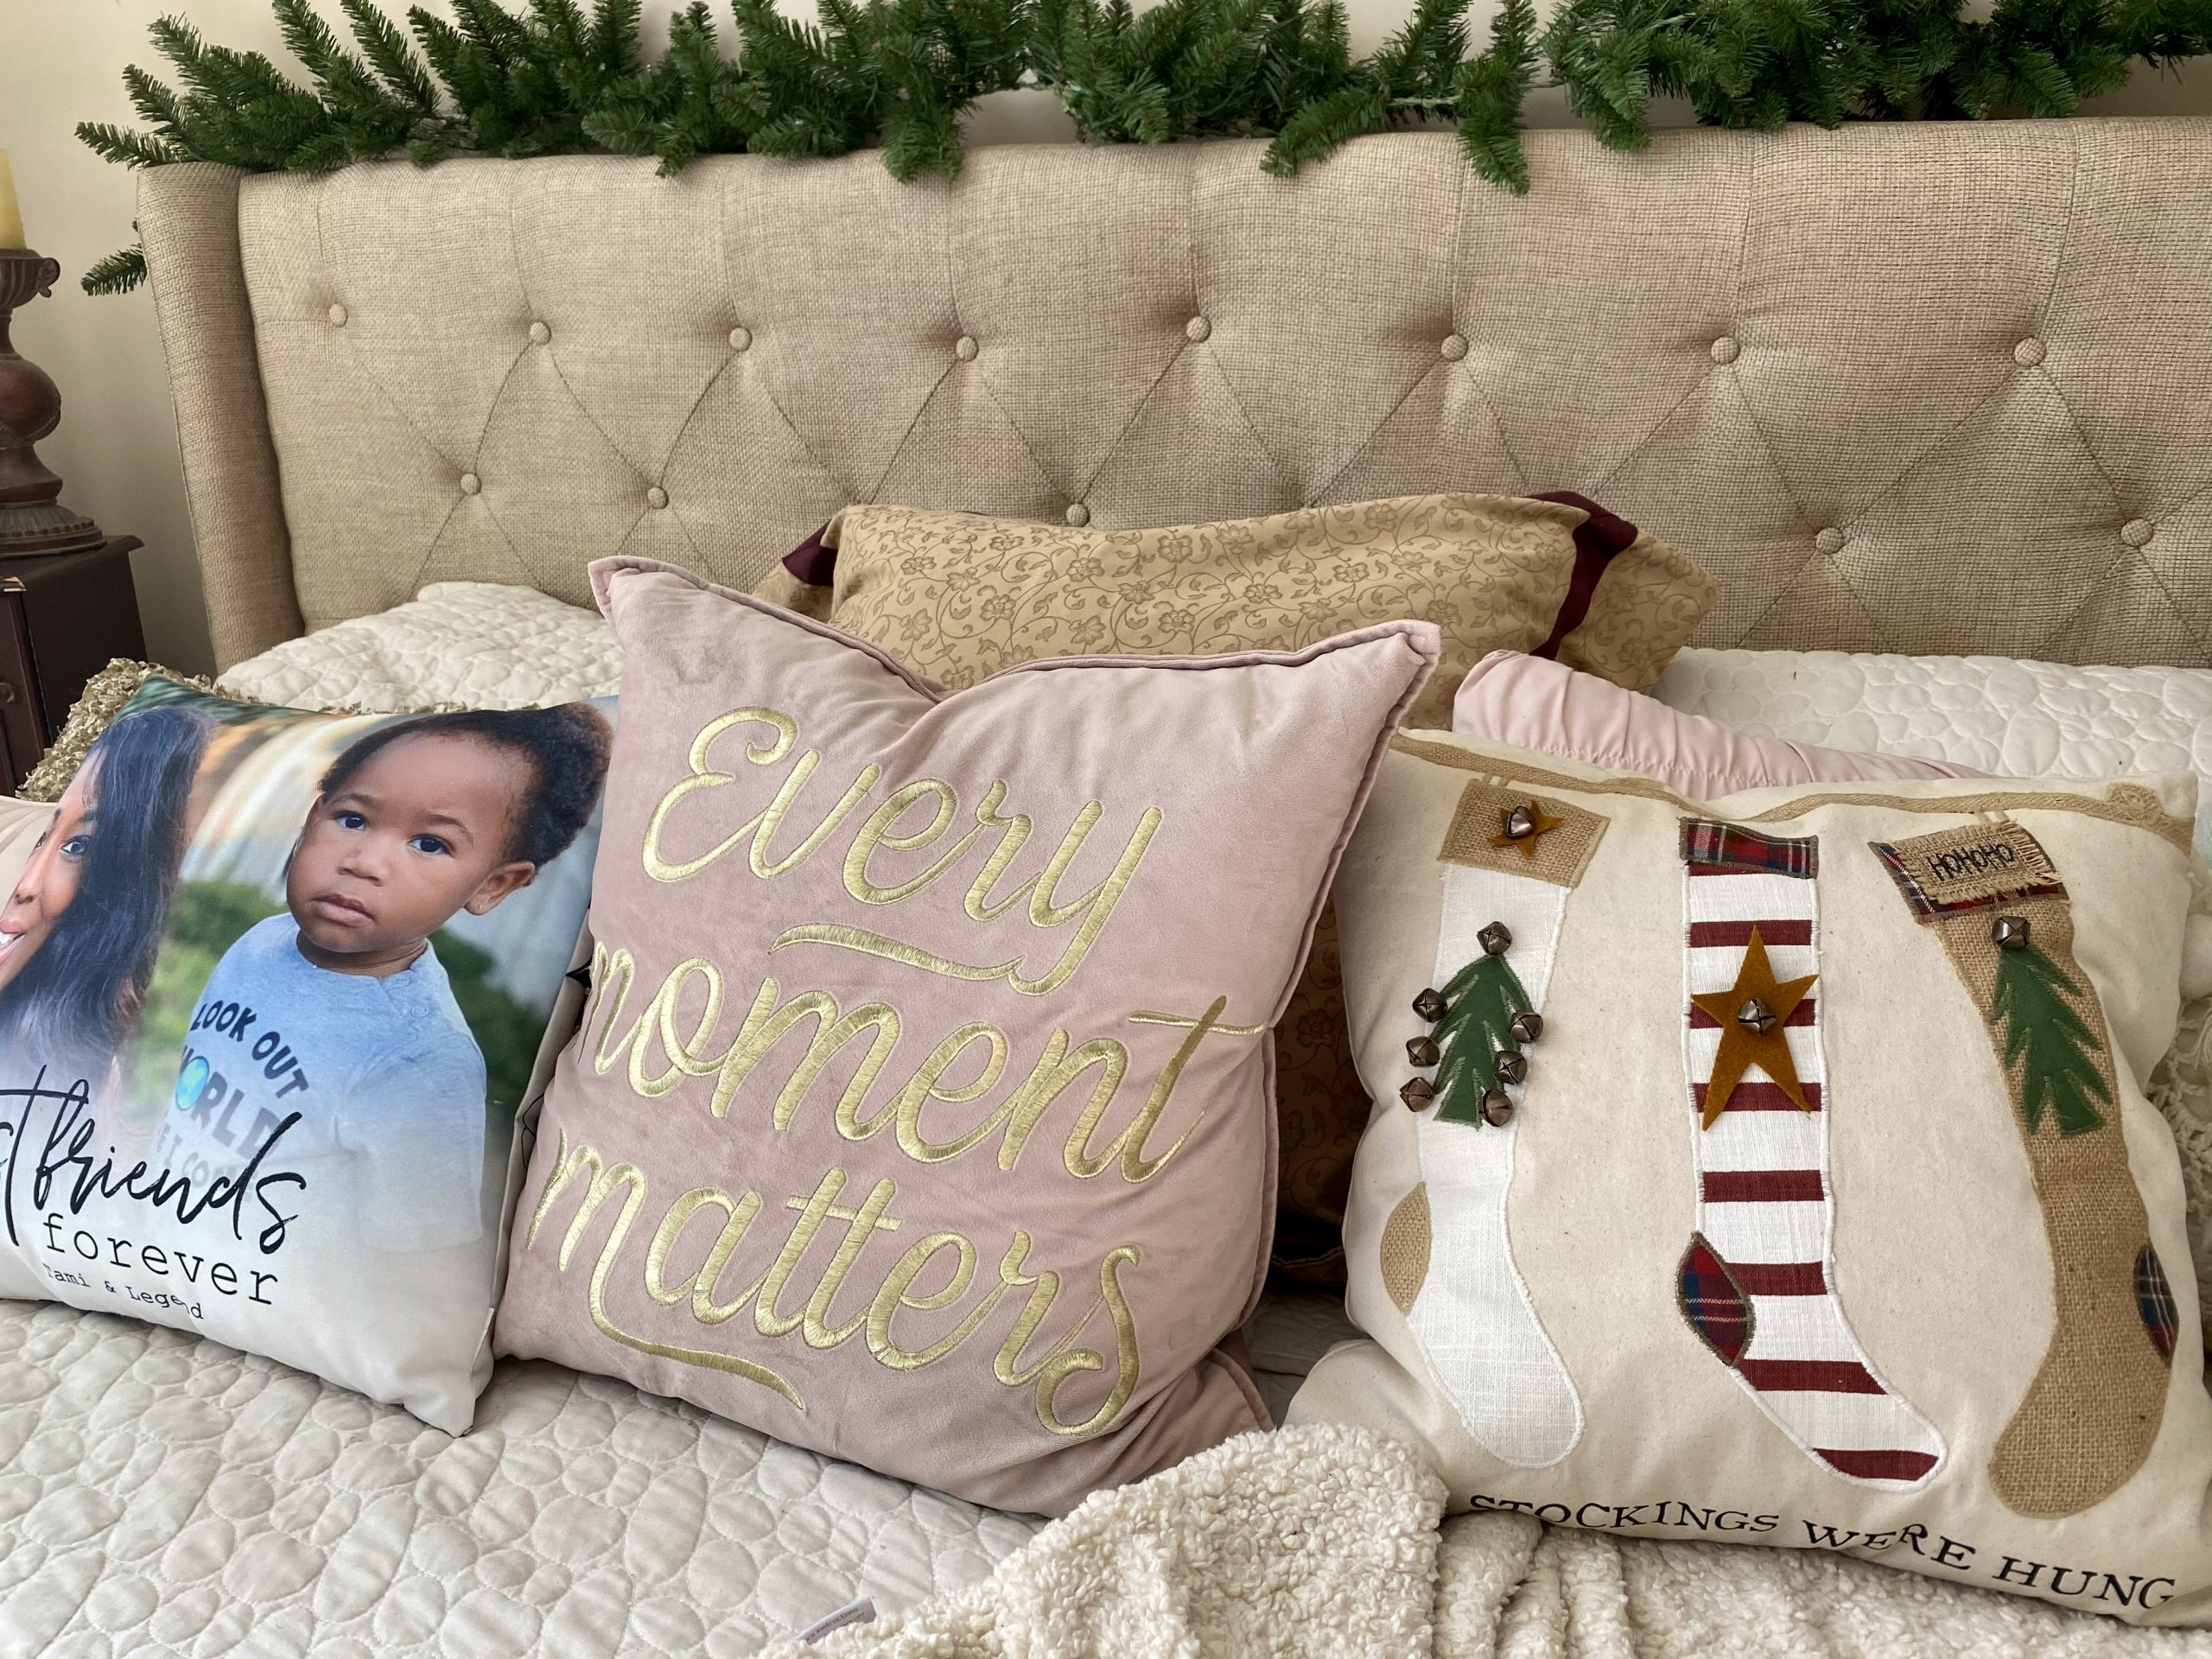 Gift Idea: Mud-Pie Christmas Stocking Pillow & Tray Set